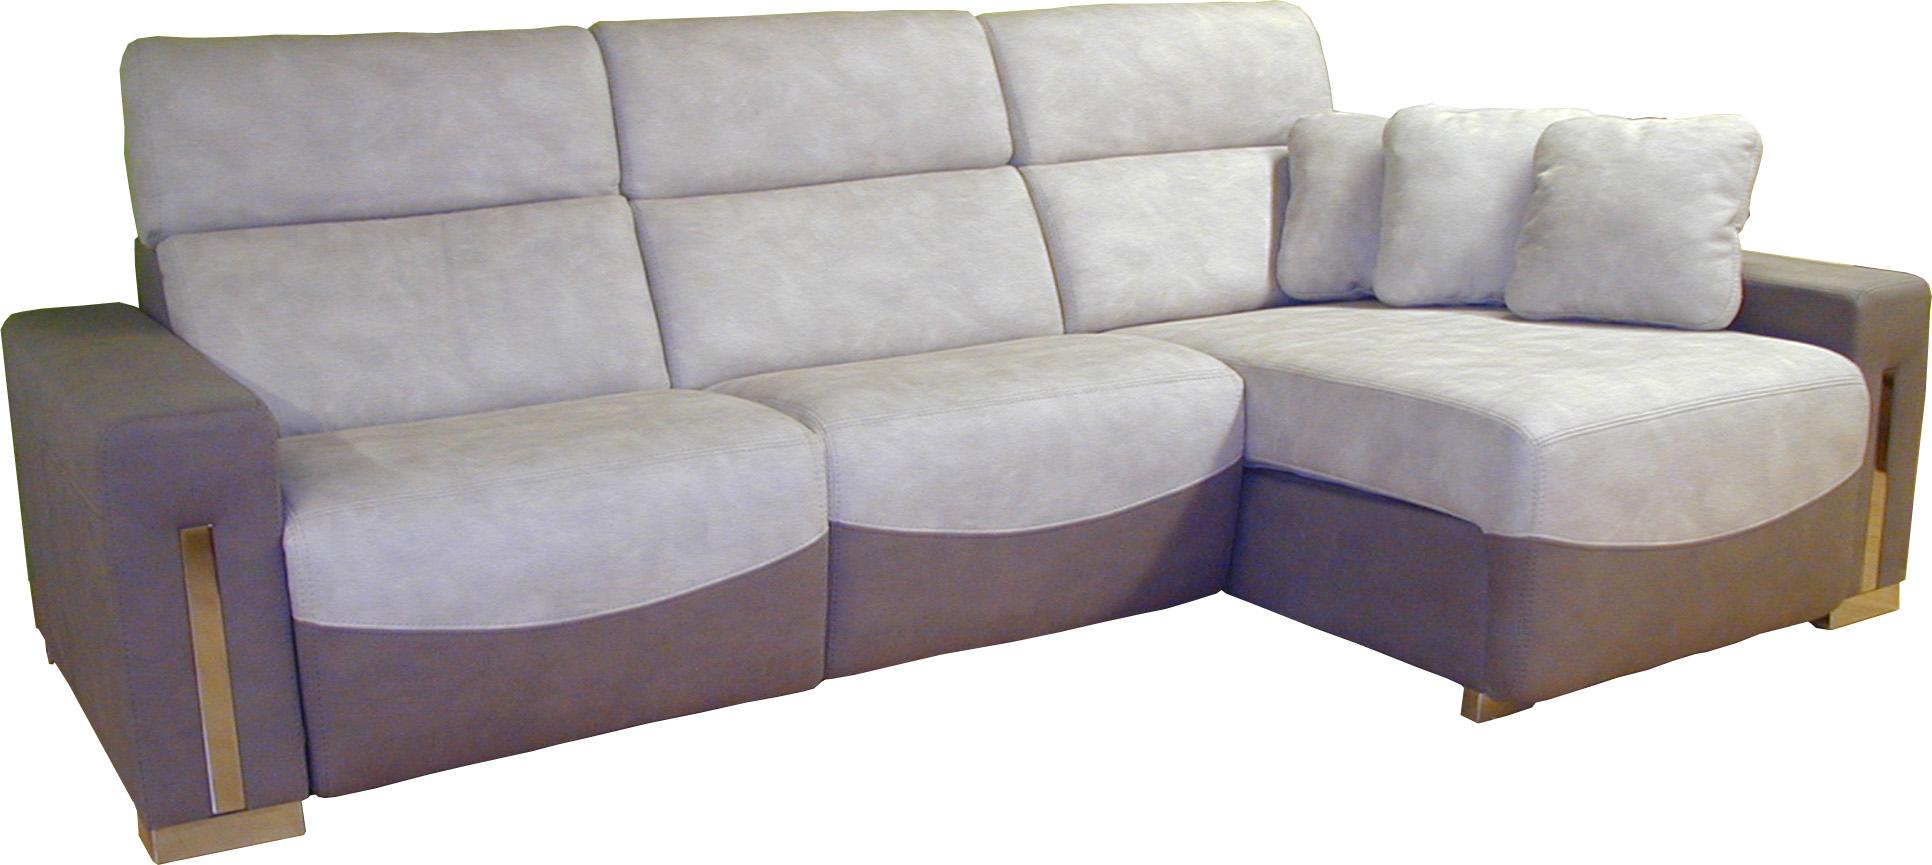 Sofa Relax Con Chaise Longue Marcas De Sofas De Diseo Iexcellent